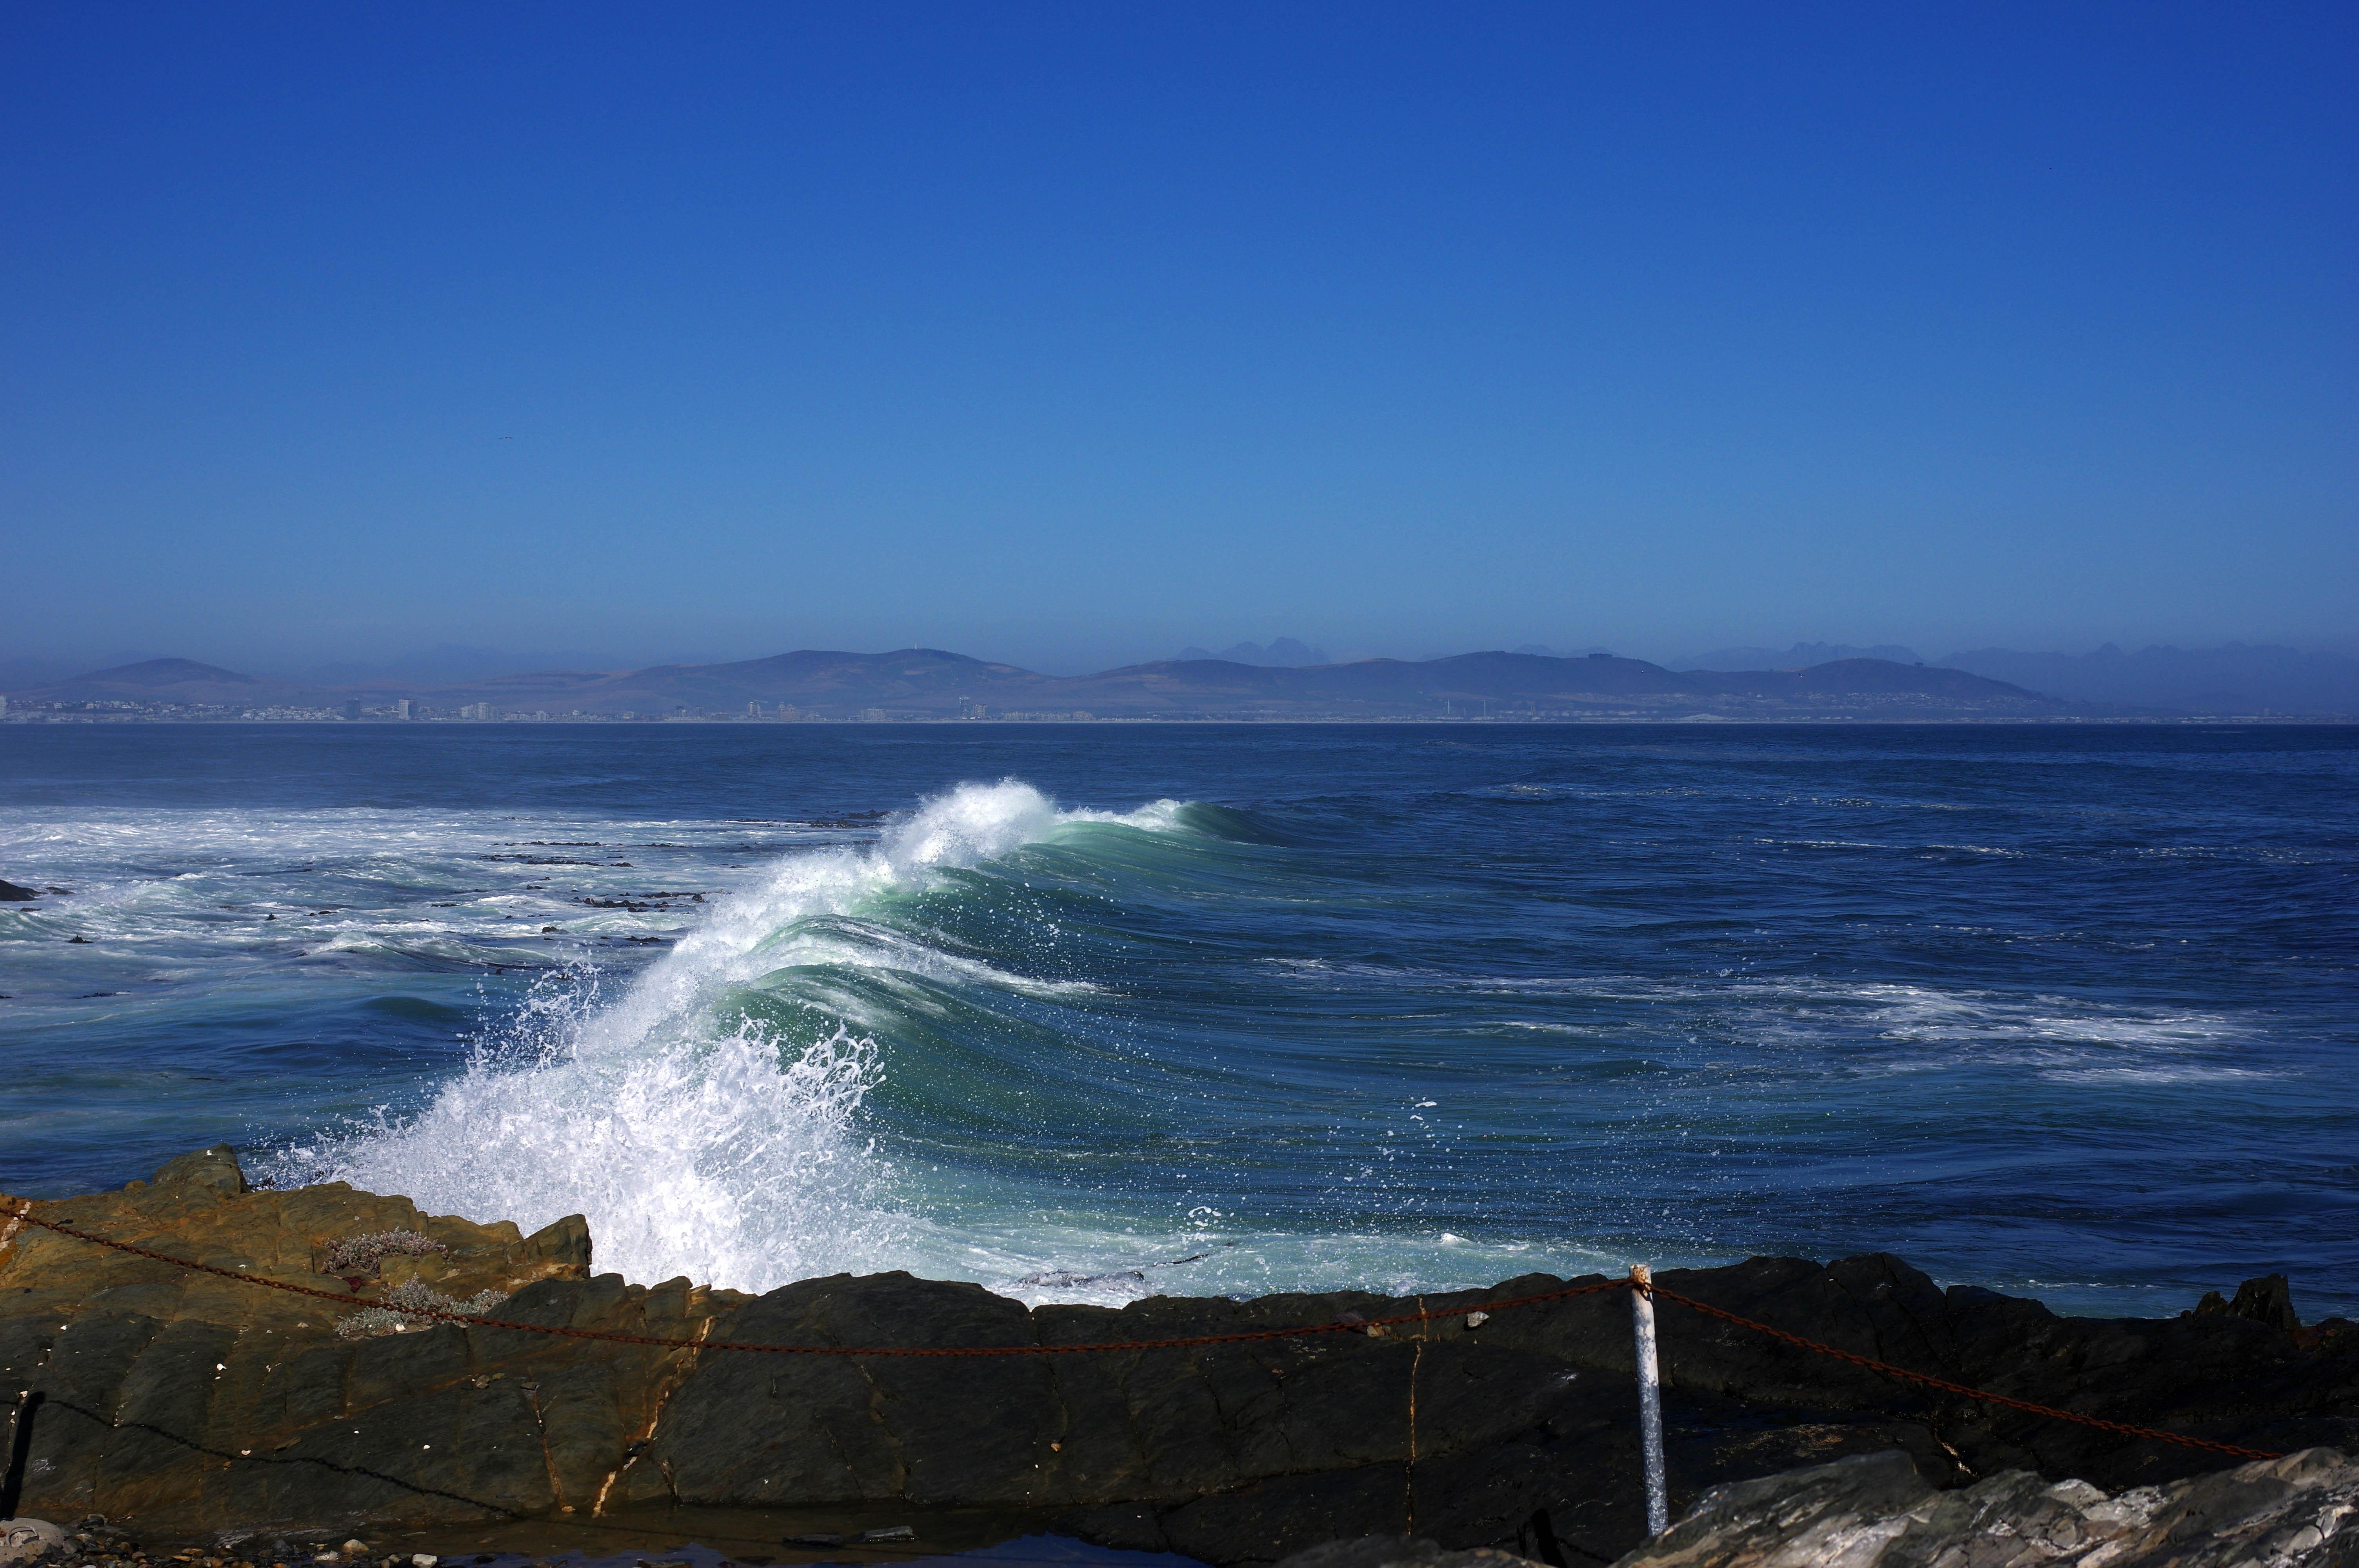 171122_CT_Robben island01